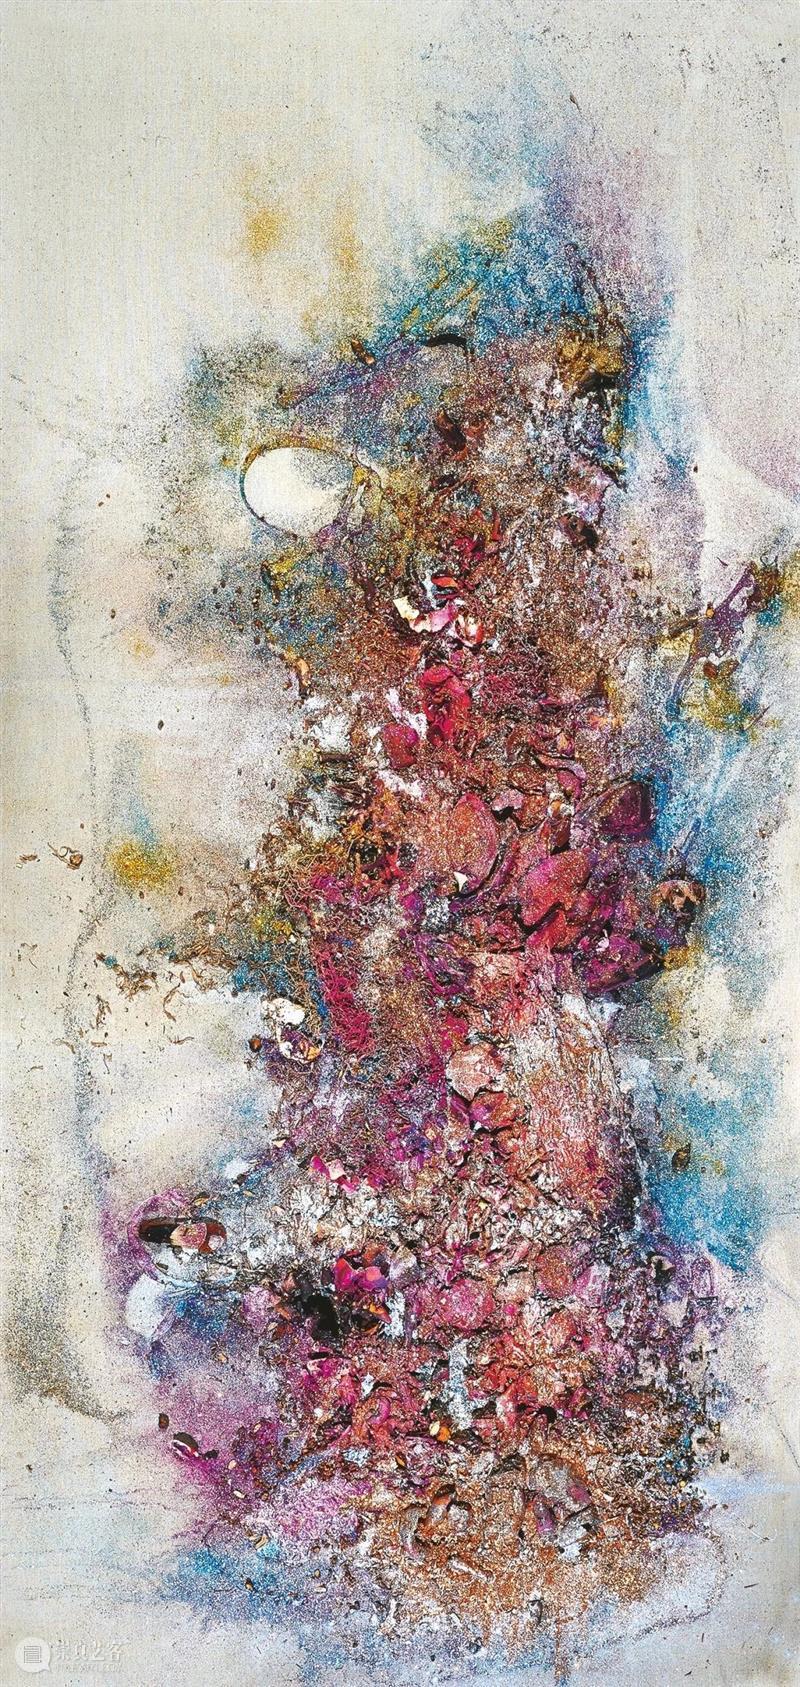 2020 ART021 参展画廊 |  尚艺画廊 Harmony Art Gallery 画廊 尚艺 不确定性 上海 廿一 艺术 博览会 上海展览中心 国家 城市 崇真艺客